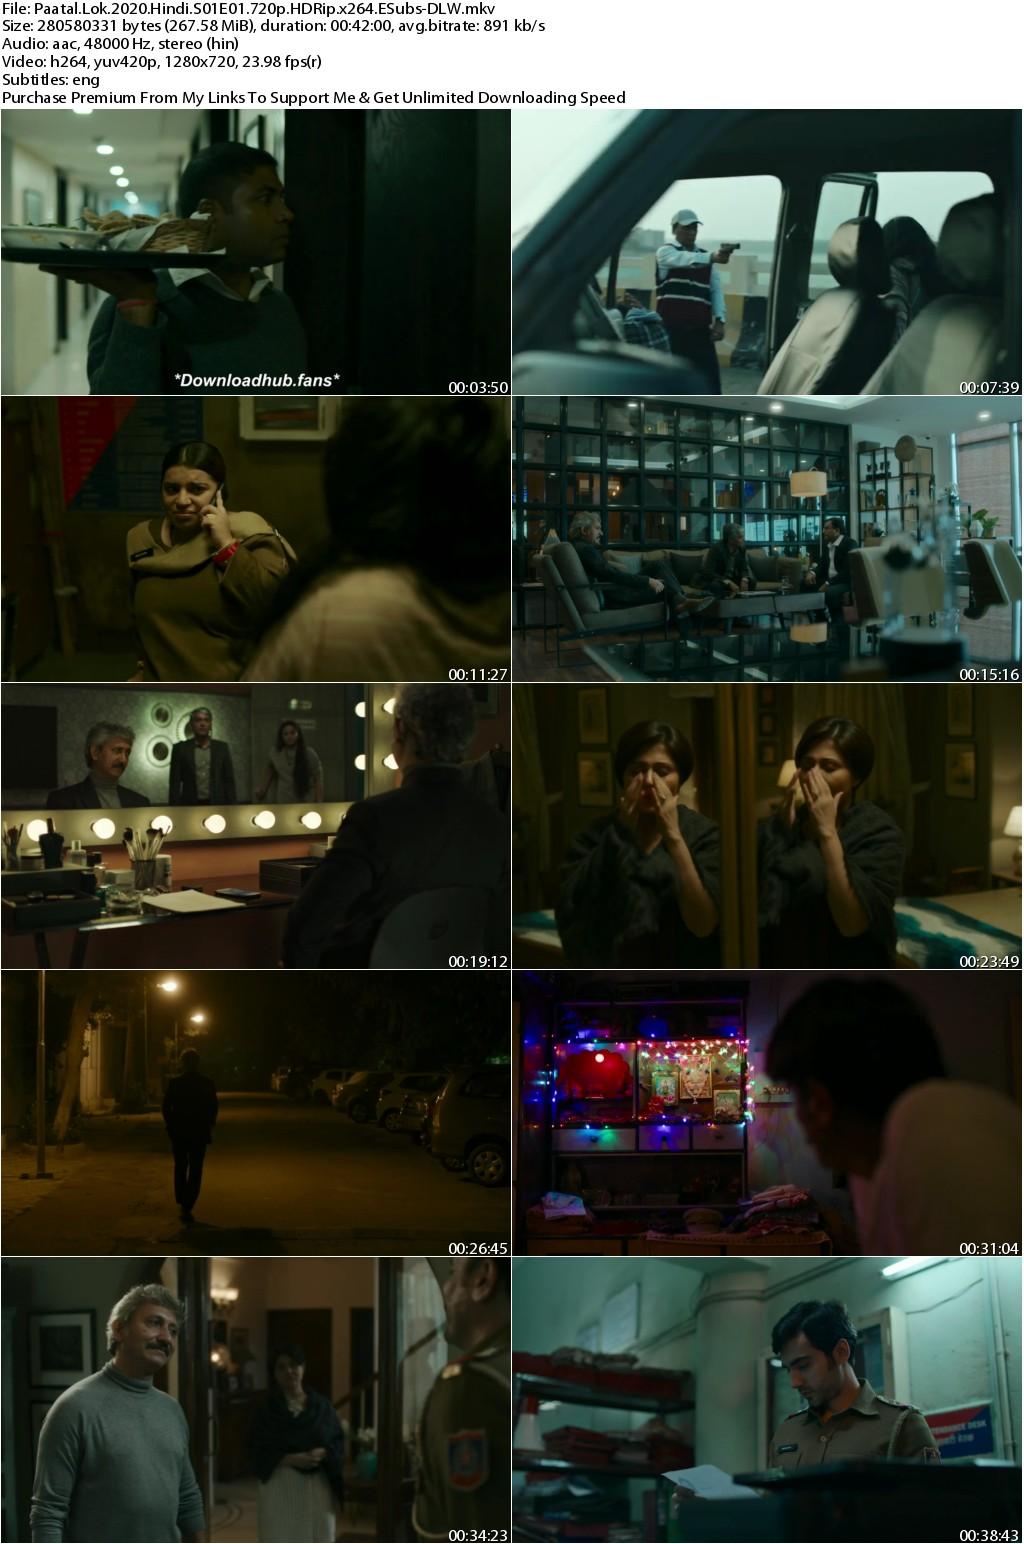 Paatal Lok 2020 Hindi Season 01 Complete 720p HDRip x264 ESubs-DLW